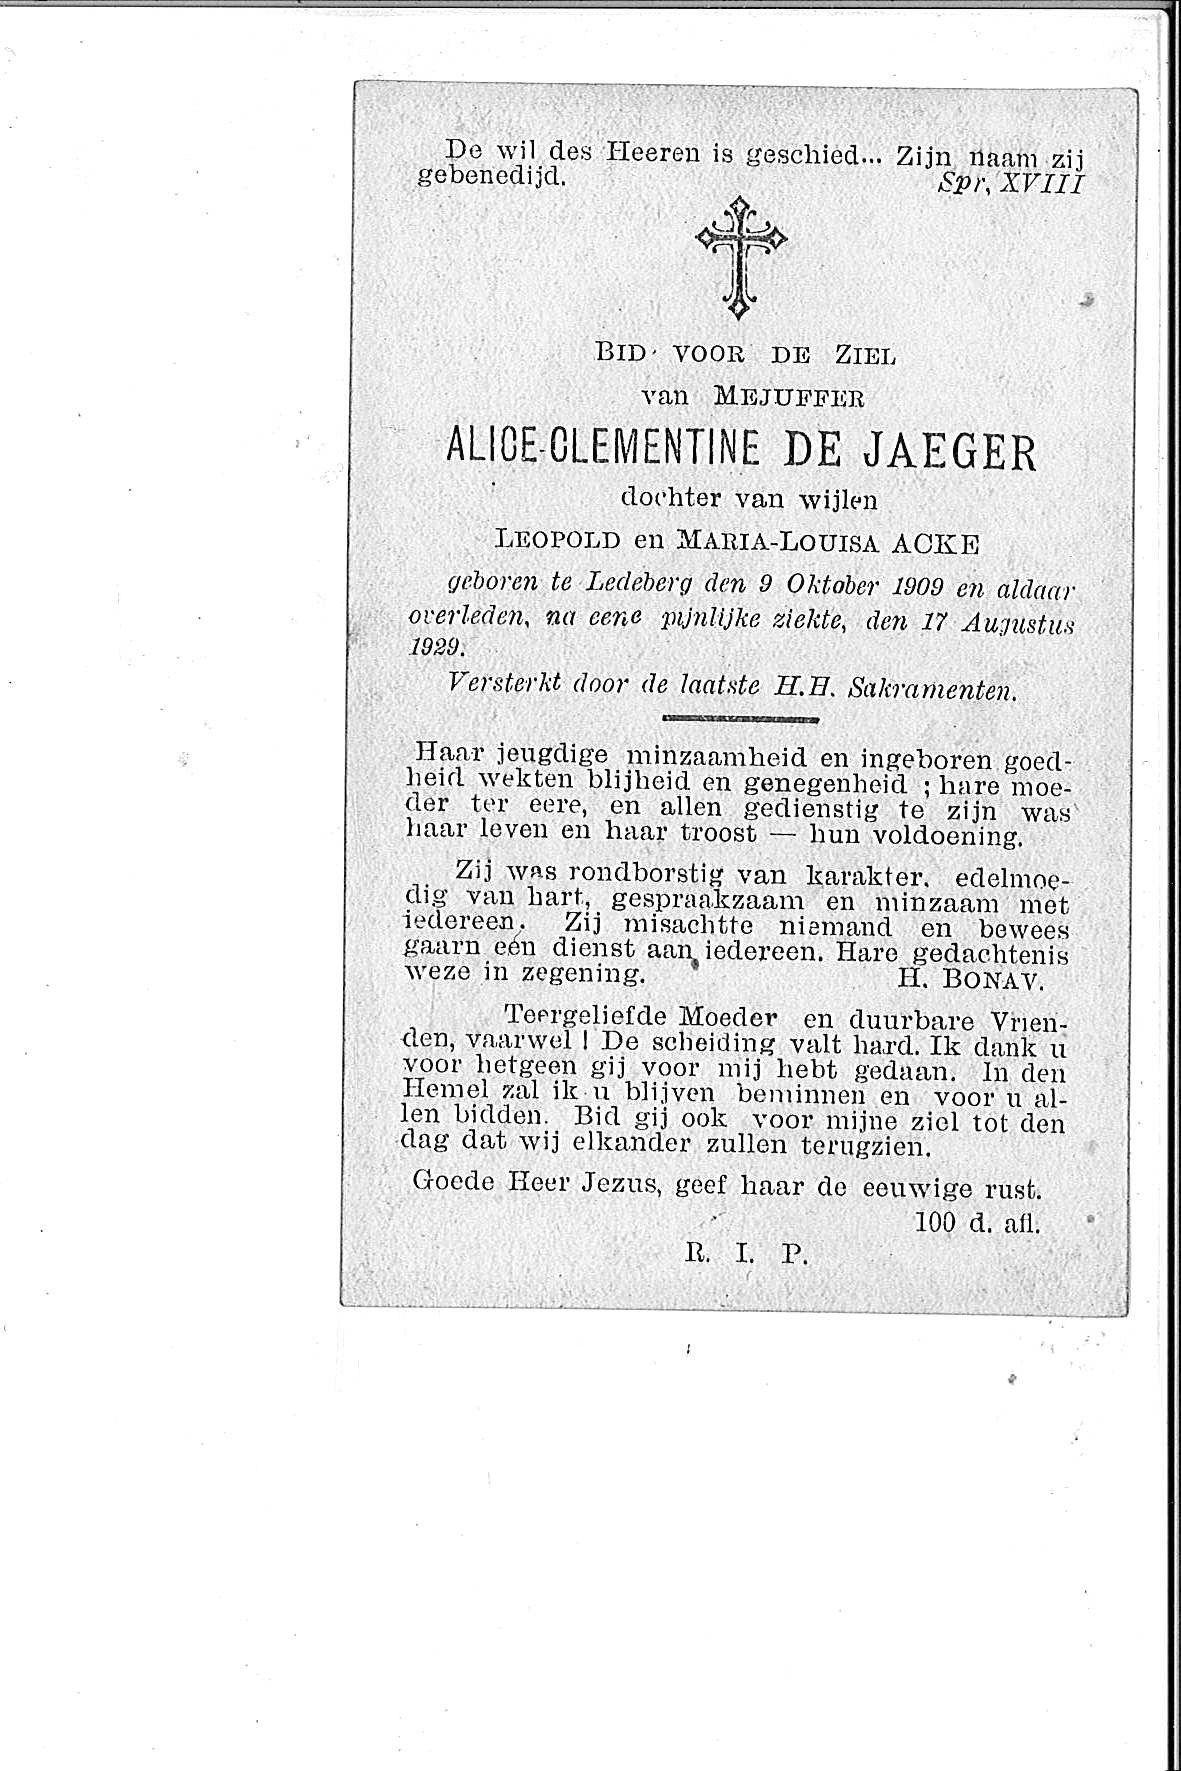 Alice-Clementine(1929)20150422085139_00030.jpg